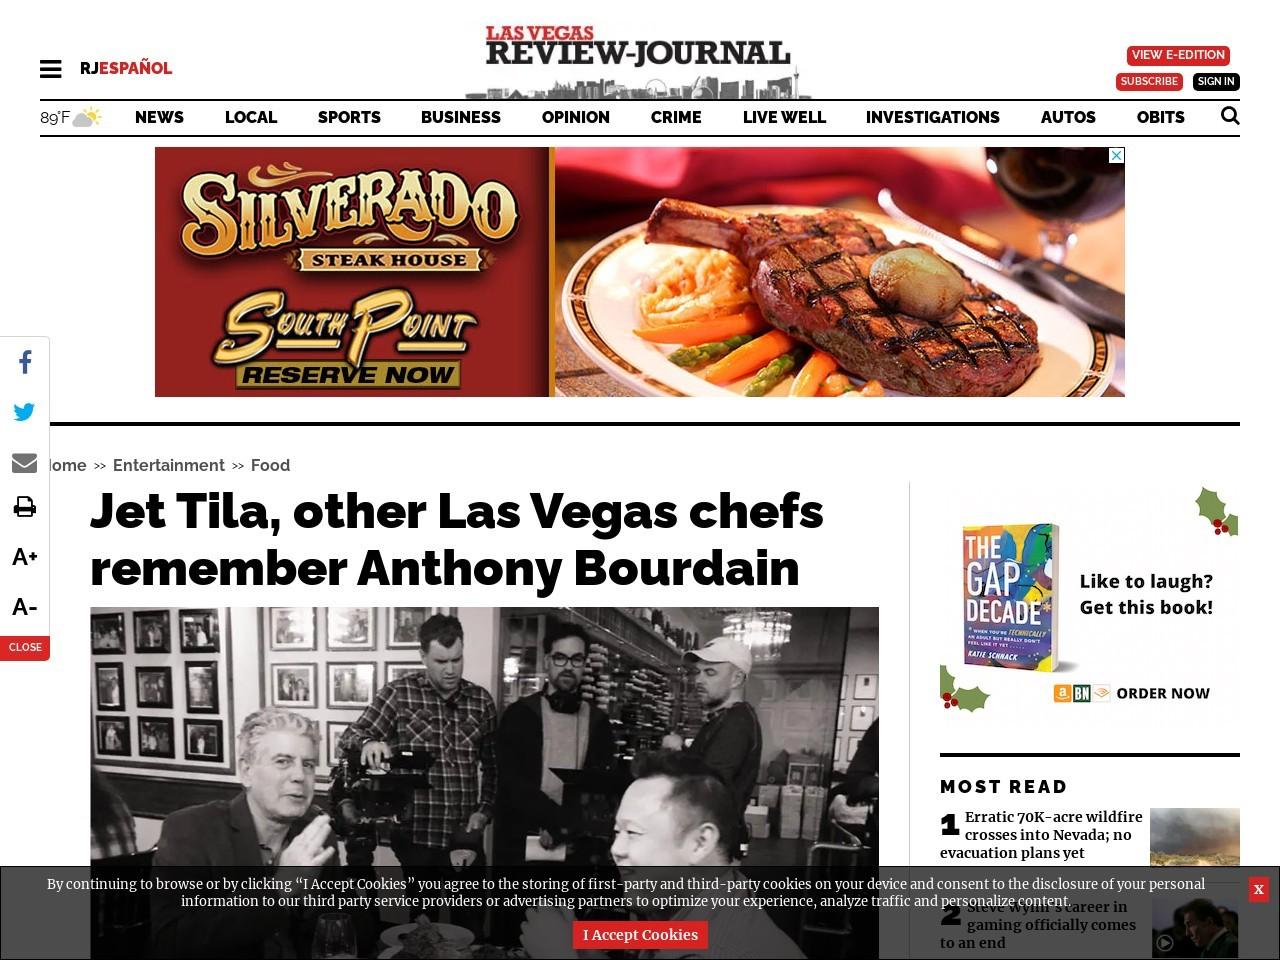 Jet Tila, other Las Vegas chefs remember Anthony Bourdain